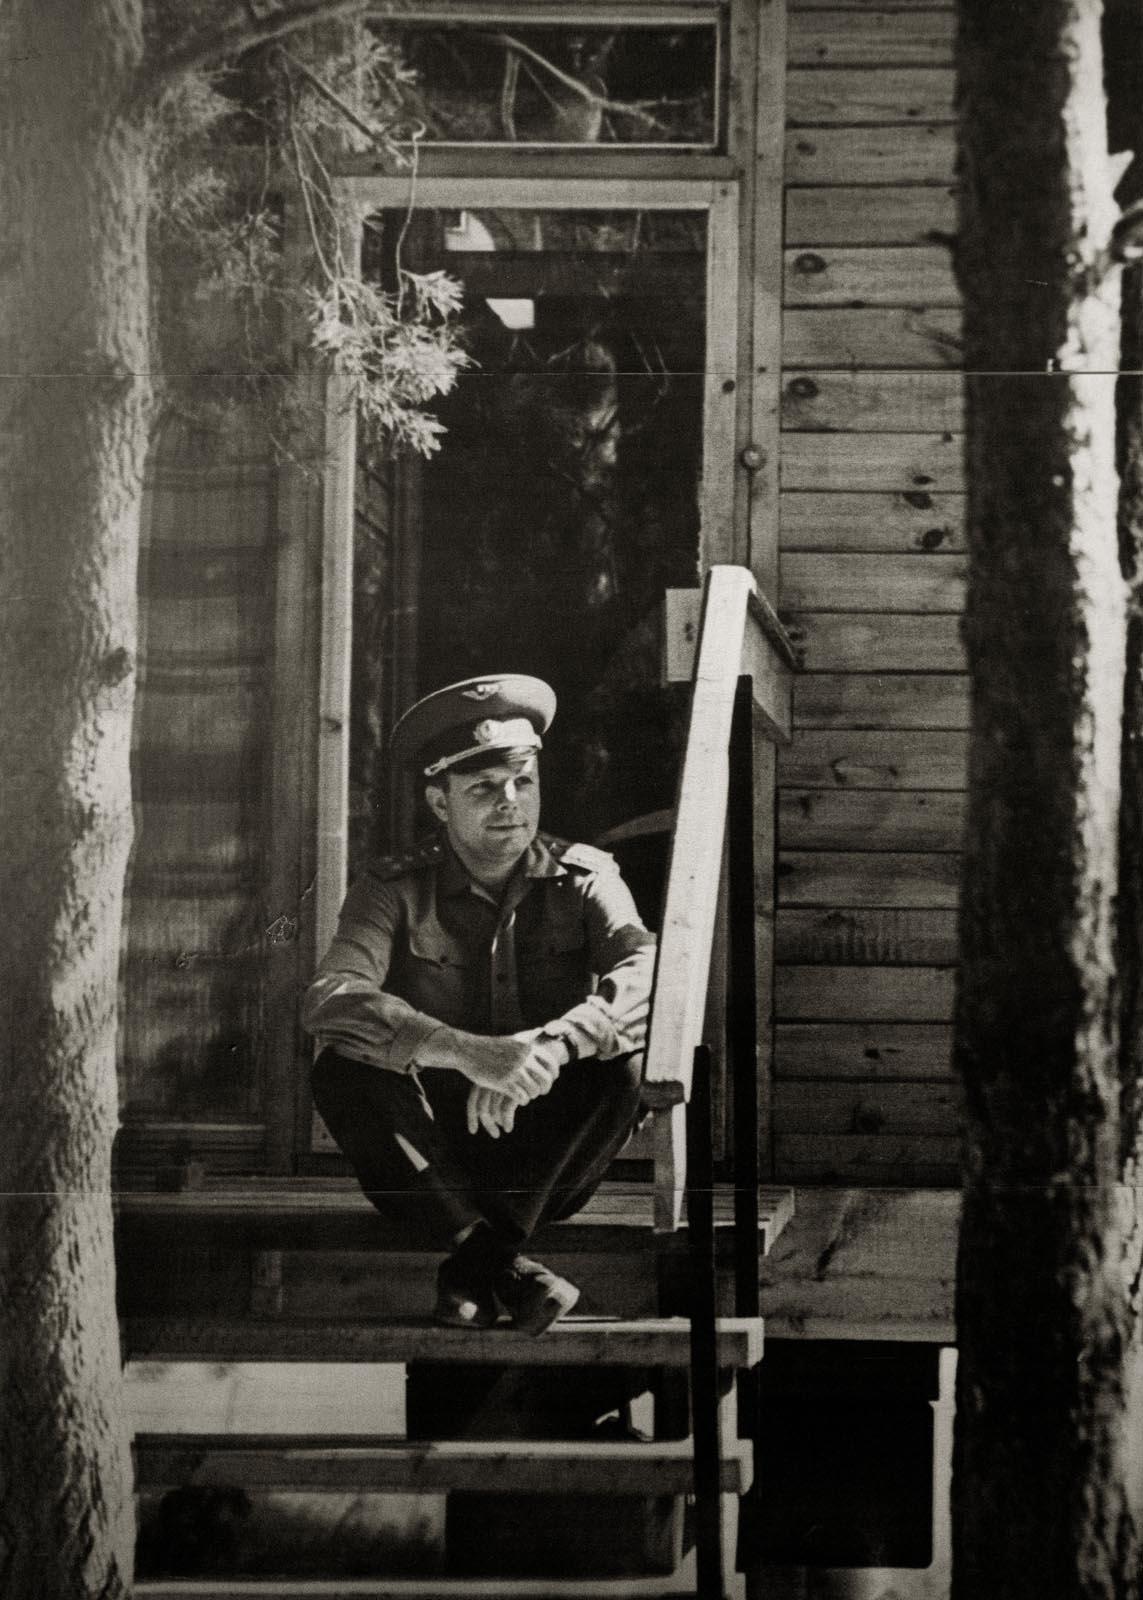 Фото №272678. Владимир Зотов. ЮРИЙ ГАГАРИН. Казань. 1967